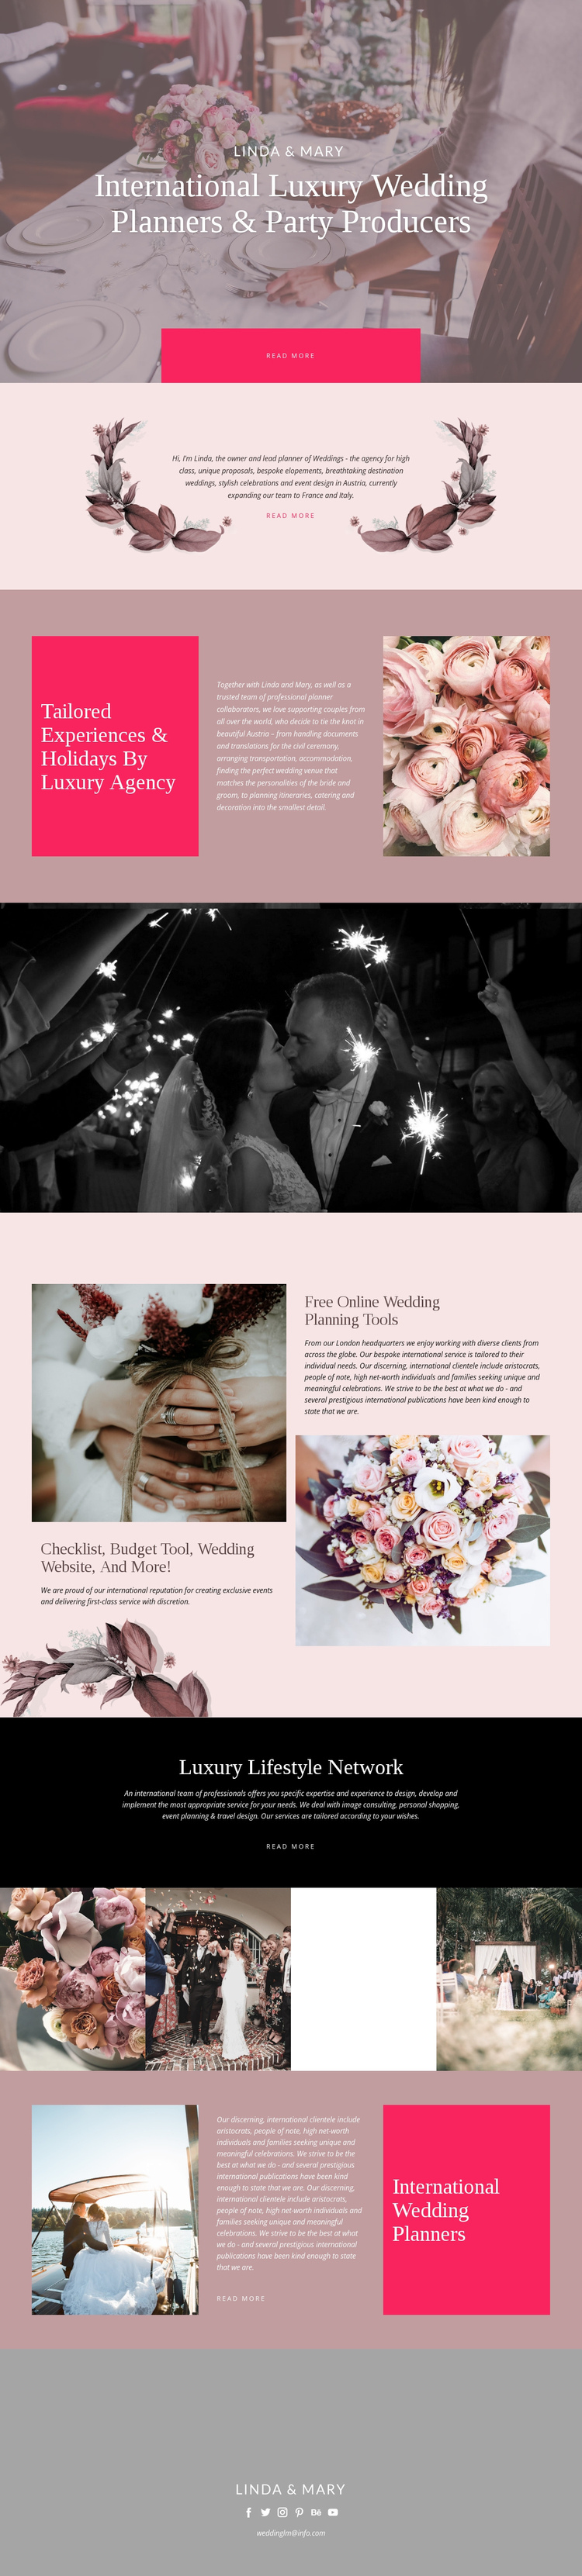 Luxury Wedding Website Builder Software